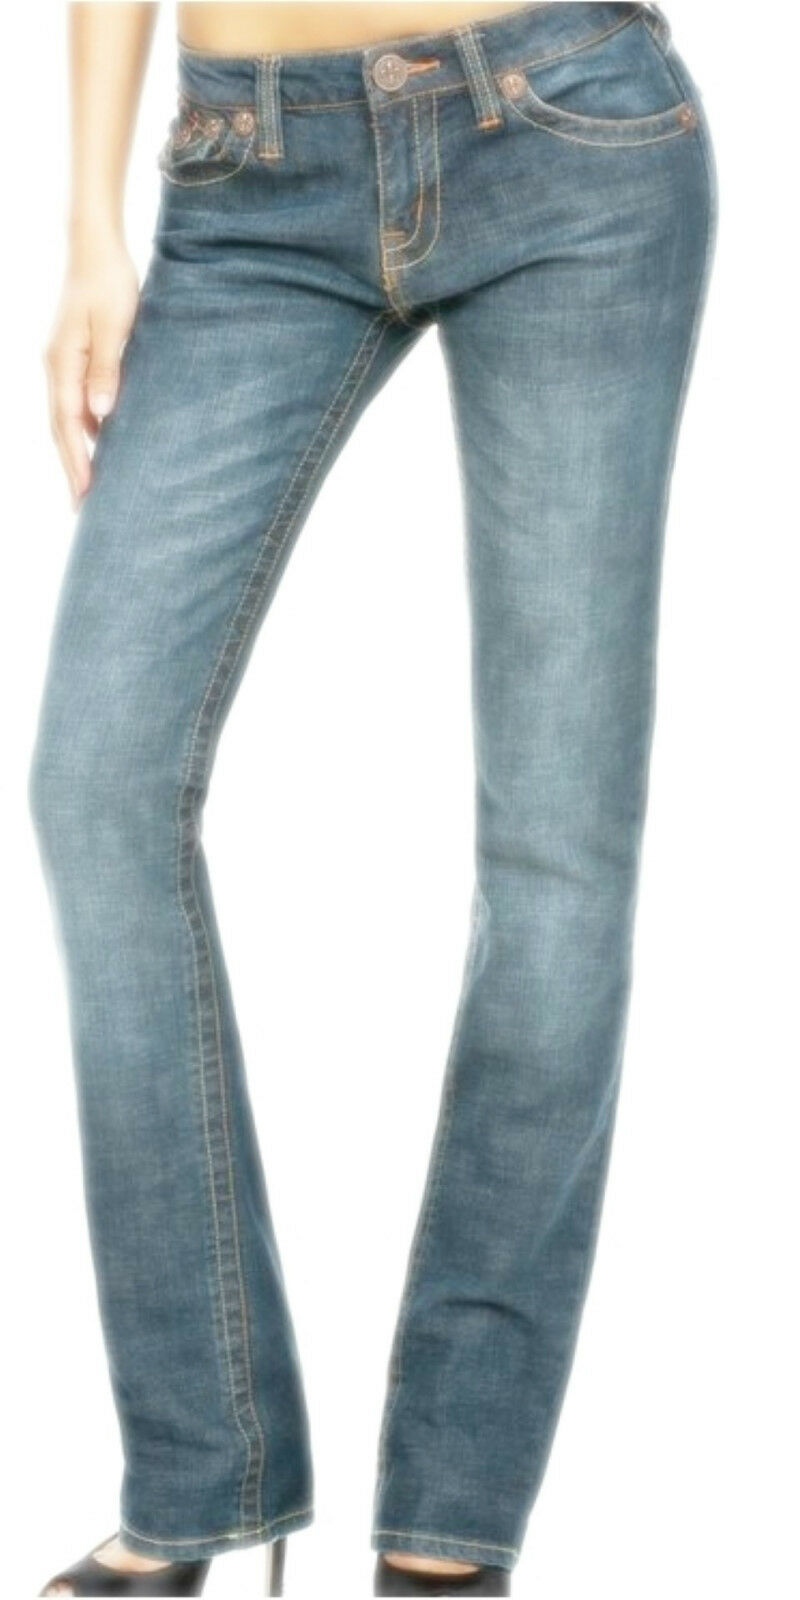 LAGUNA BEACH Phantom Pocket Damen damen Jeans CRYSTAL COVE COVE COVE W27 PVP  NEU 27a865